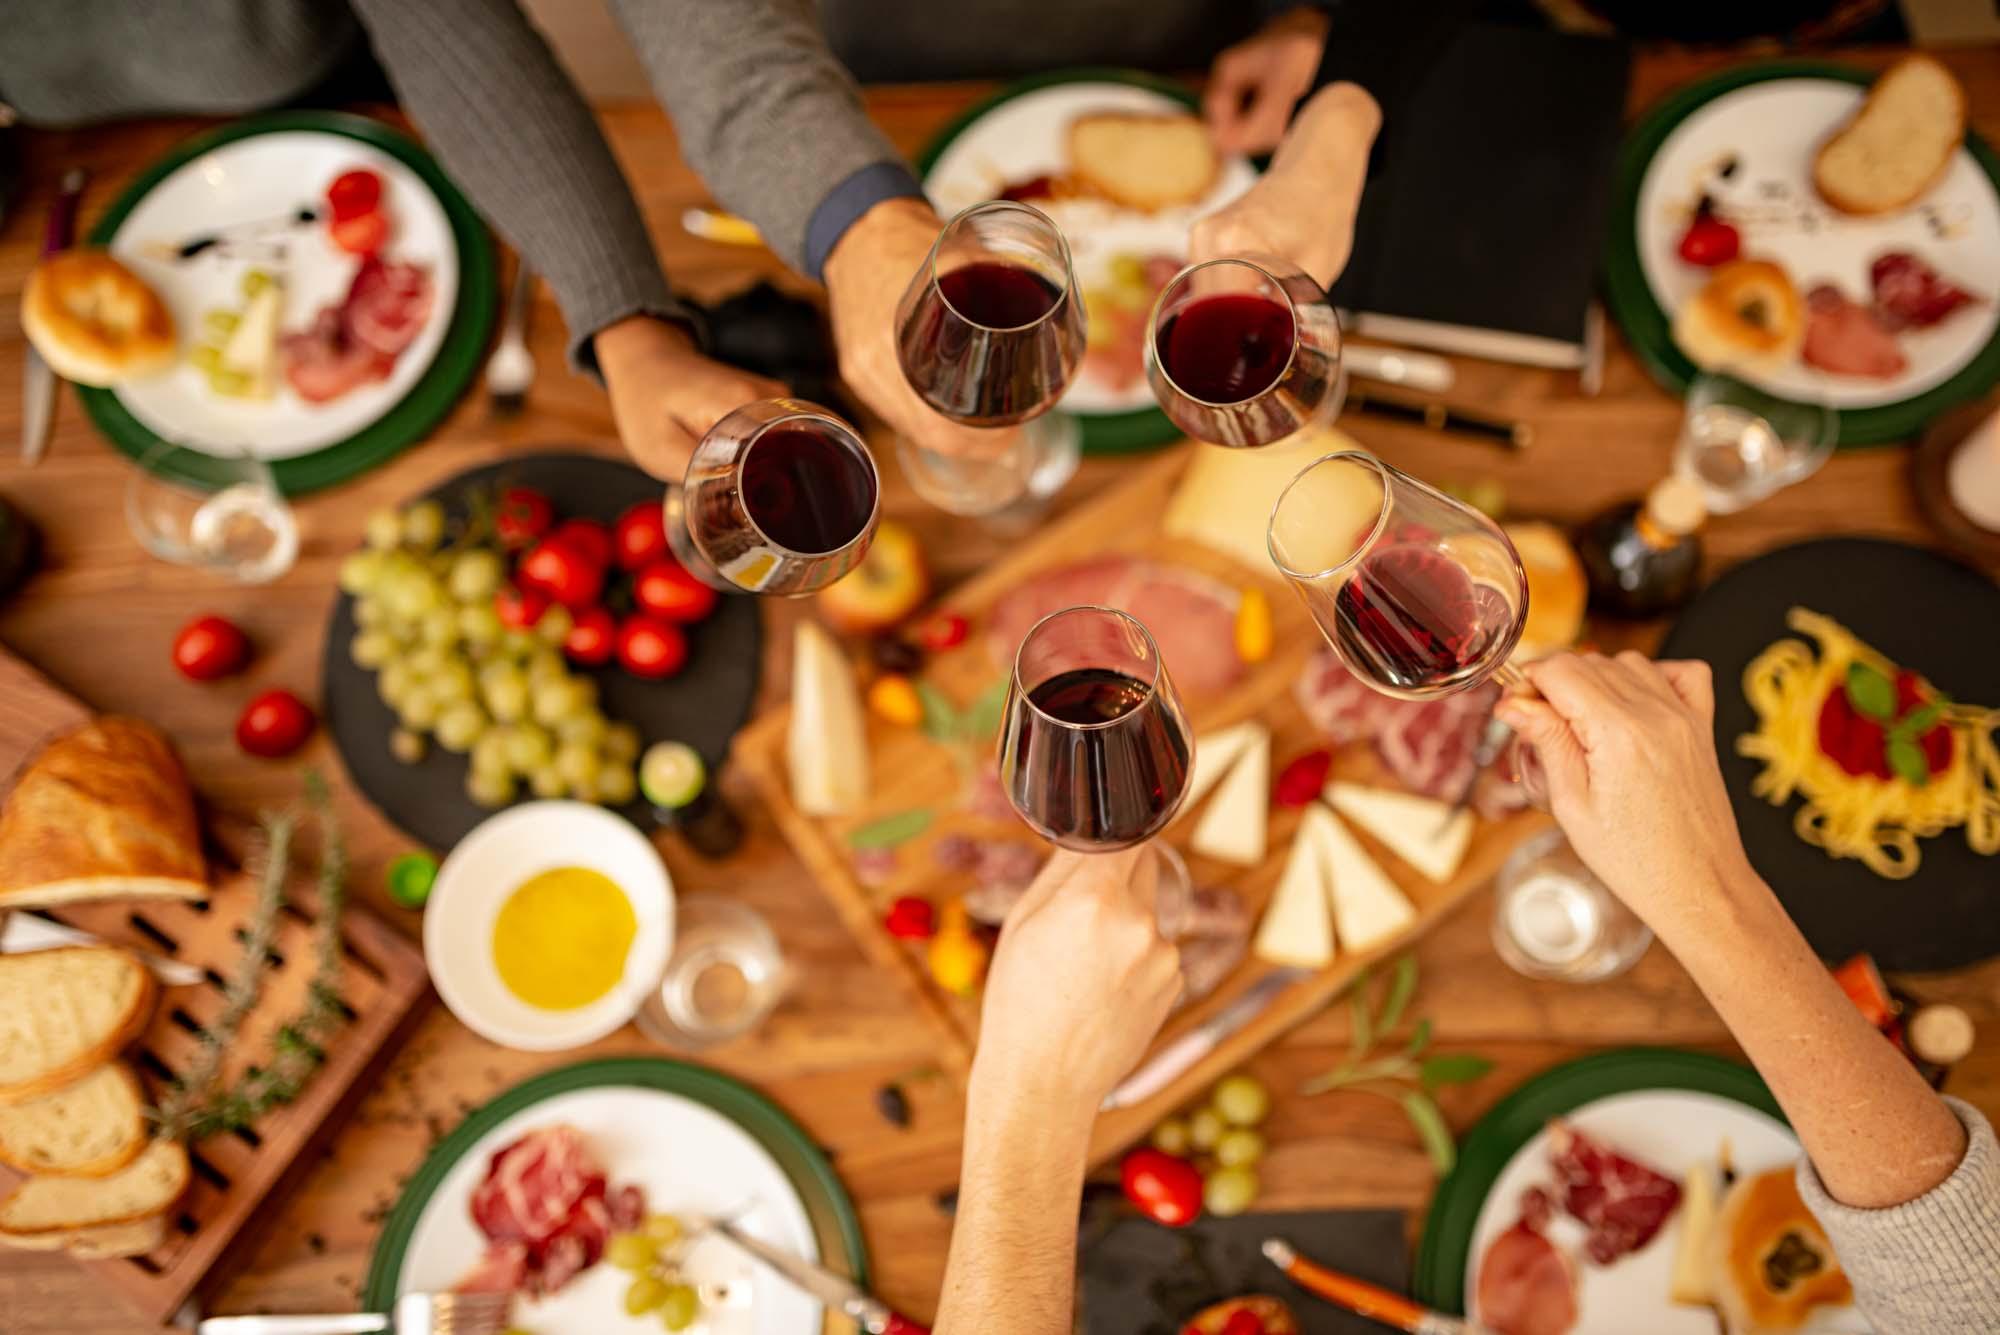 Corsi Di Cucina Cene Aziendali a Parma